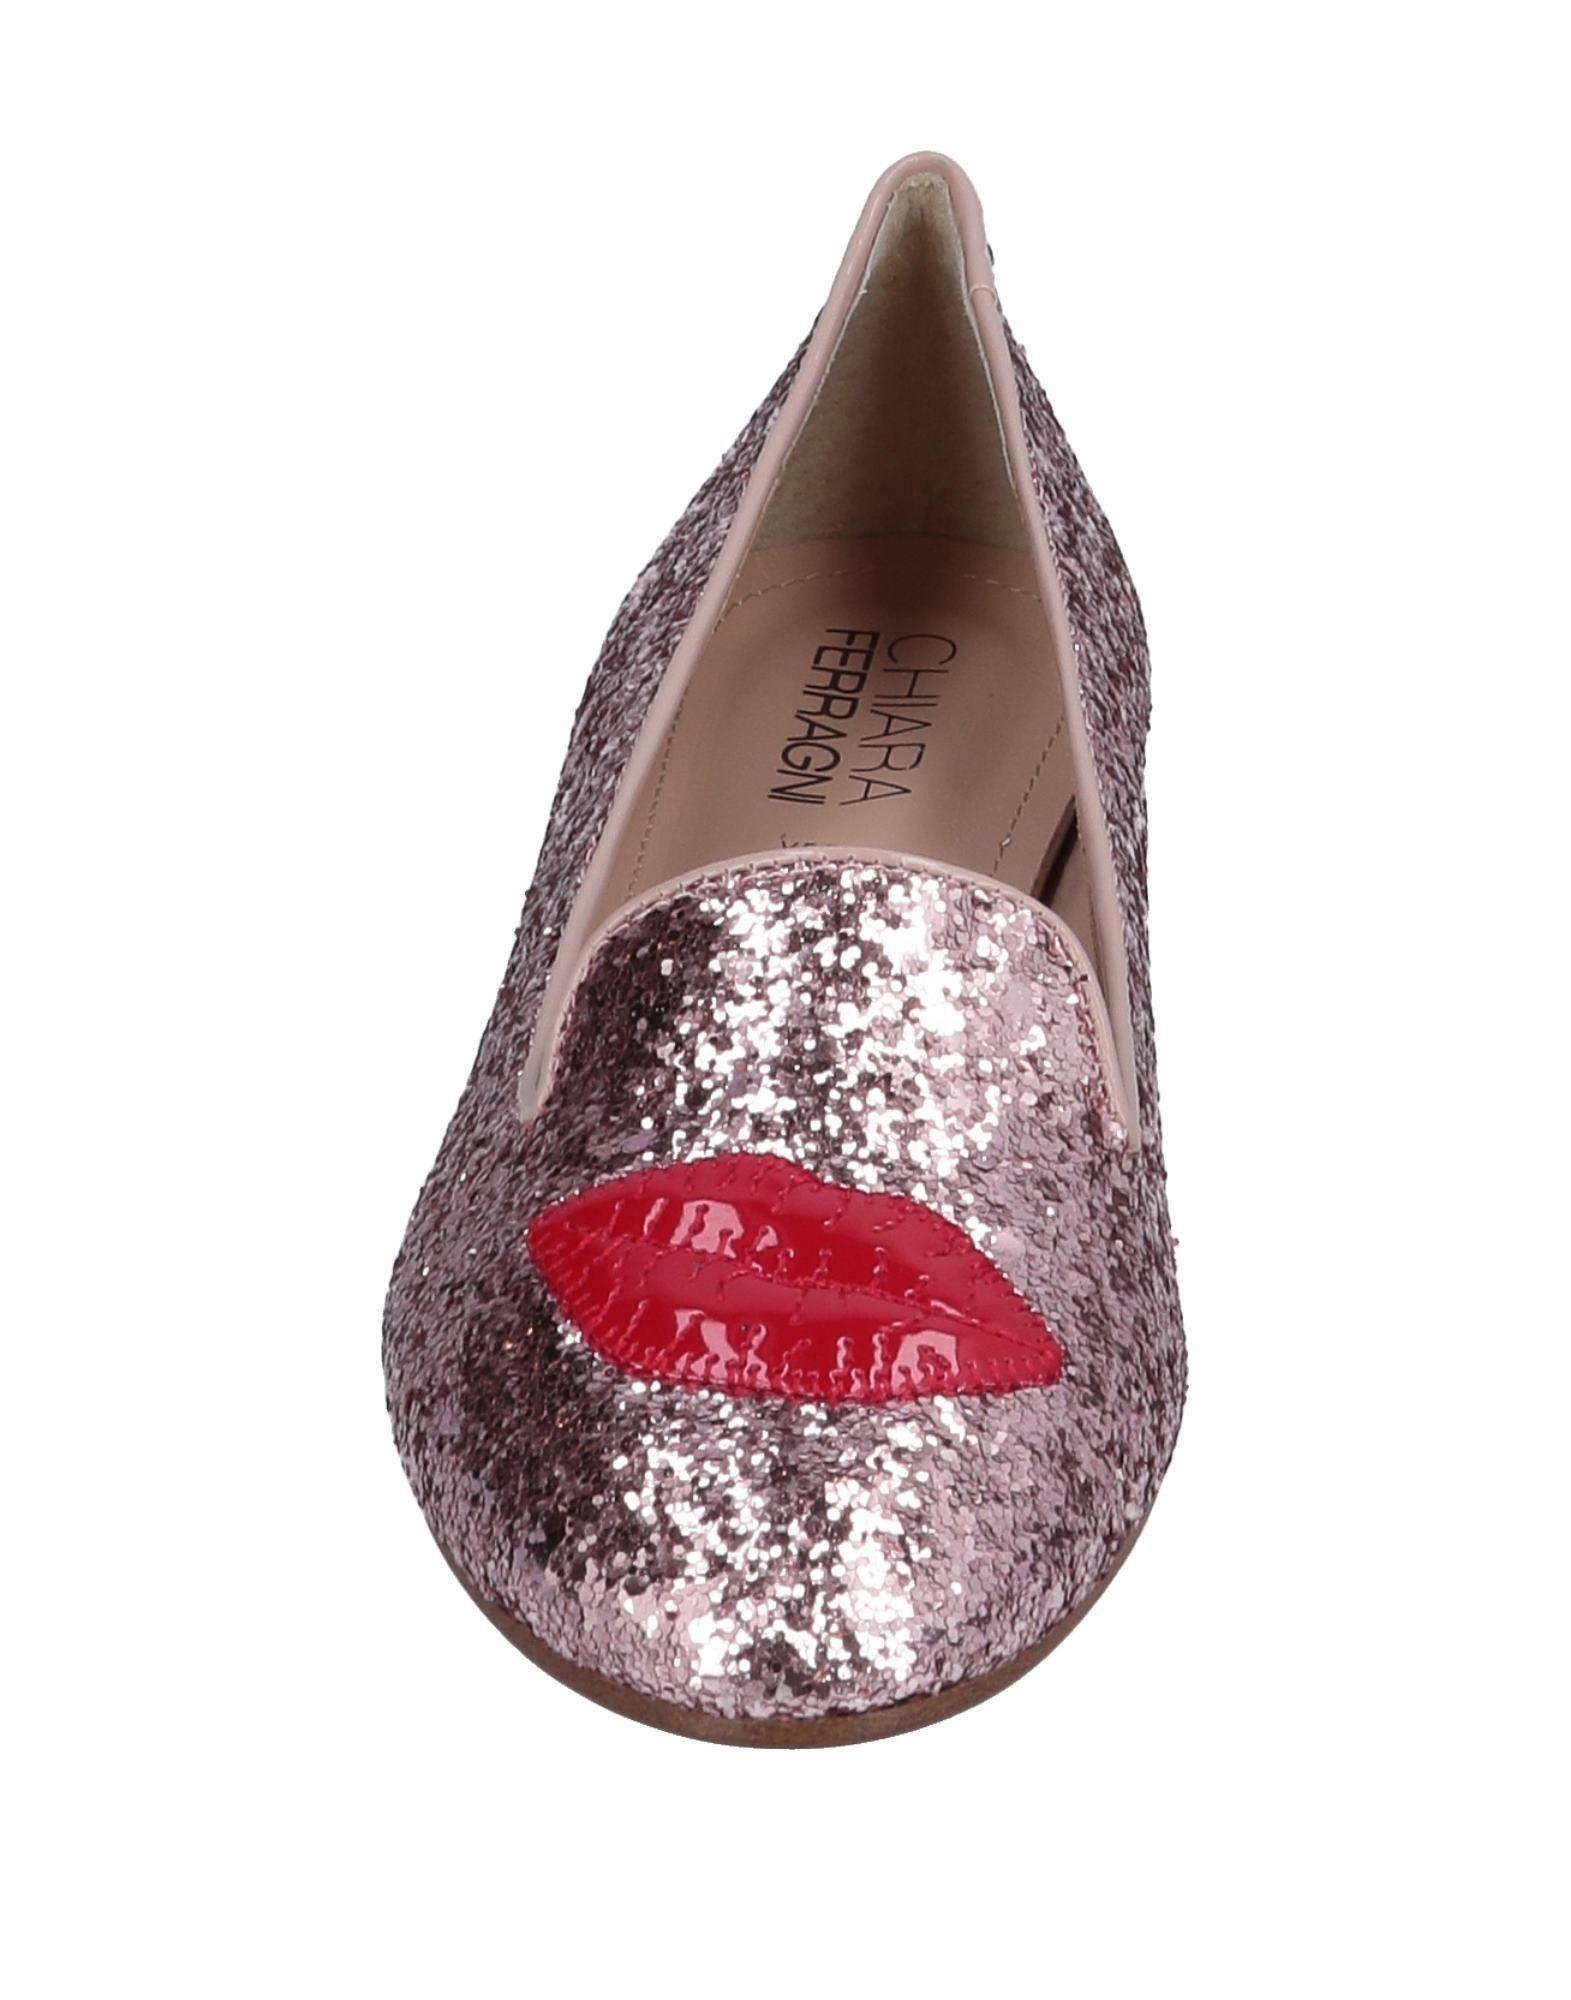 Stilvolle Stilvolle Stilvolle billige Schuhe Chiara Ferragni Ballerinas Damen  11395434NG d88b2d